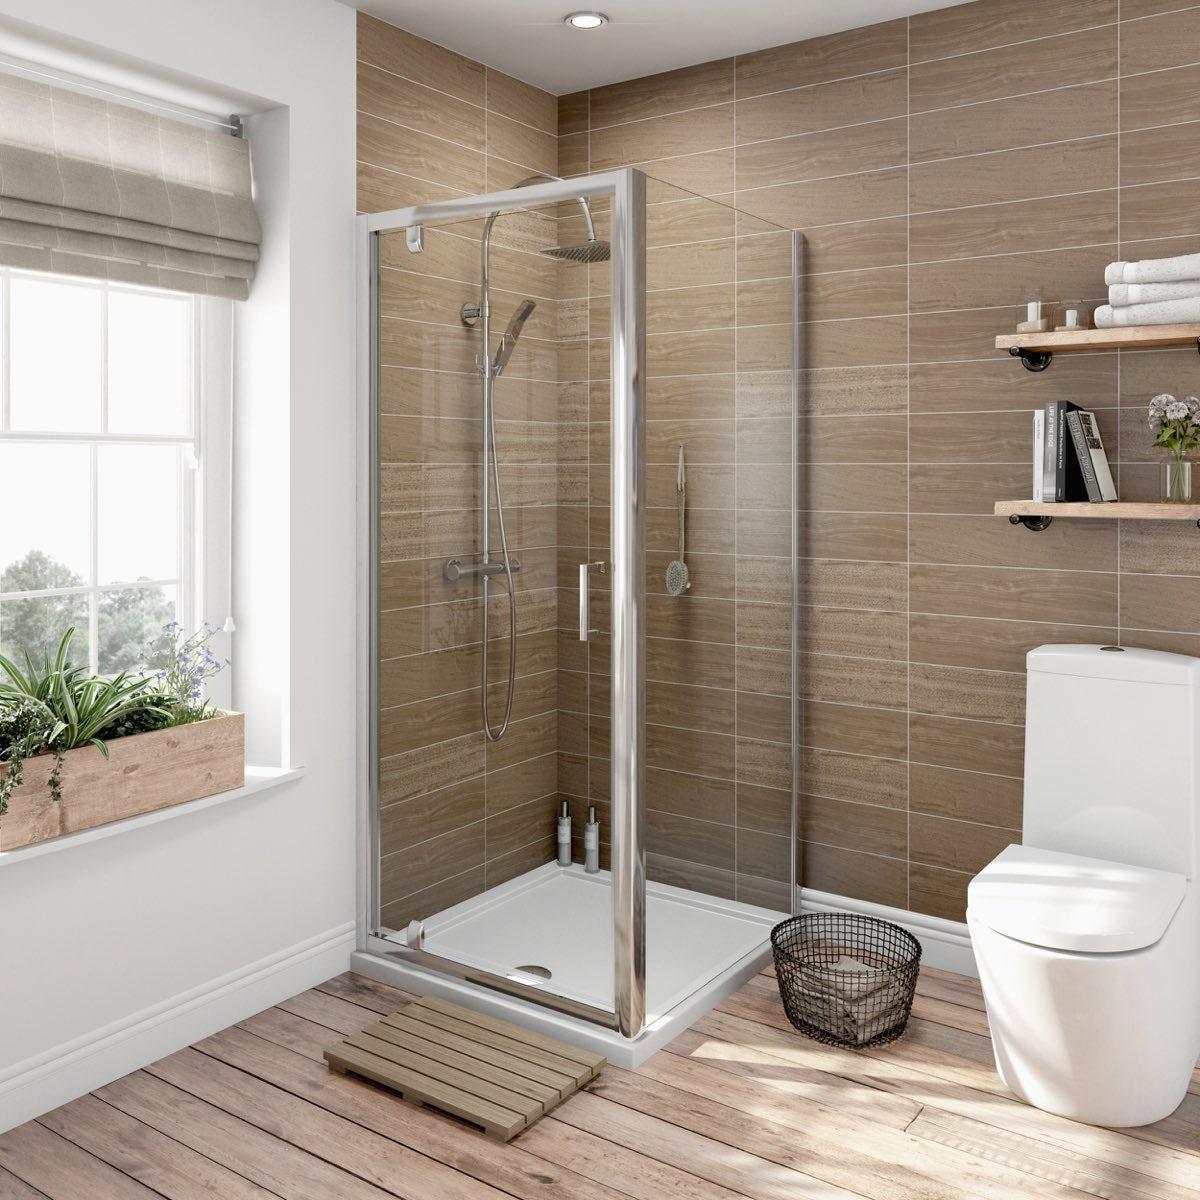 Orchard 6mm Pivot Door Square Shower Enclosure